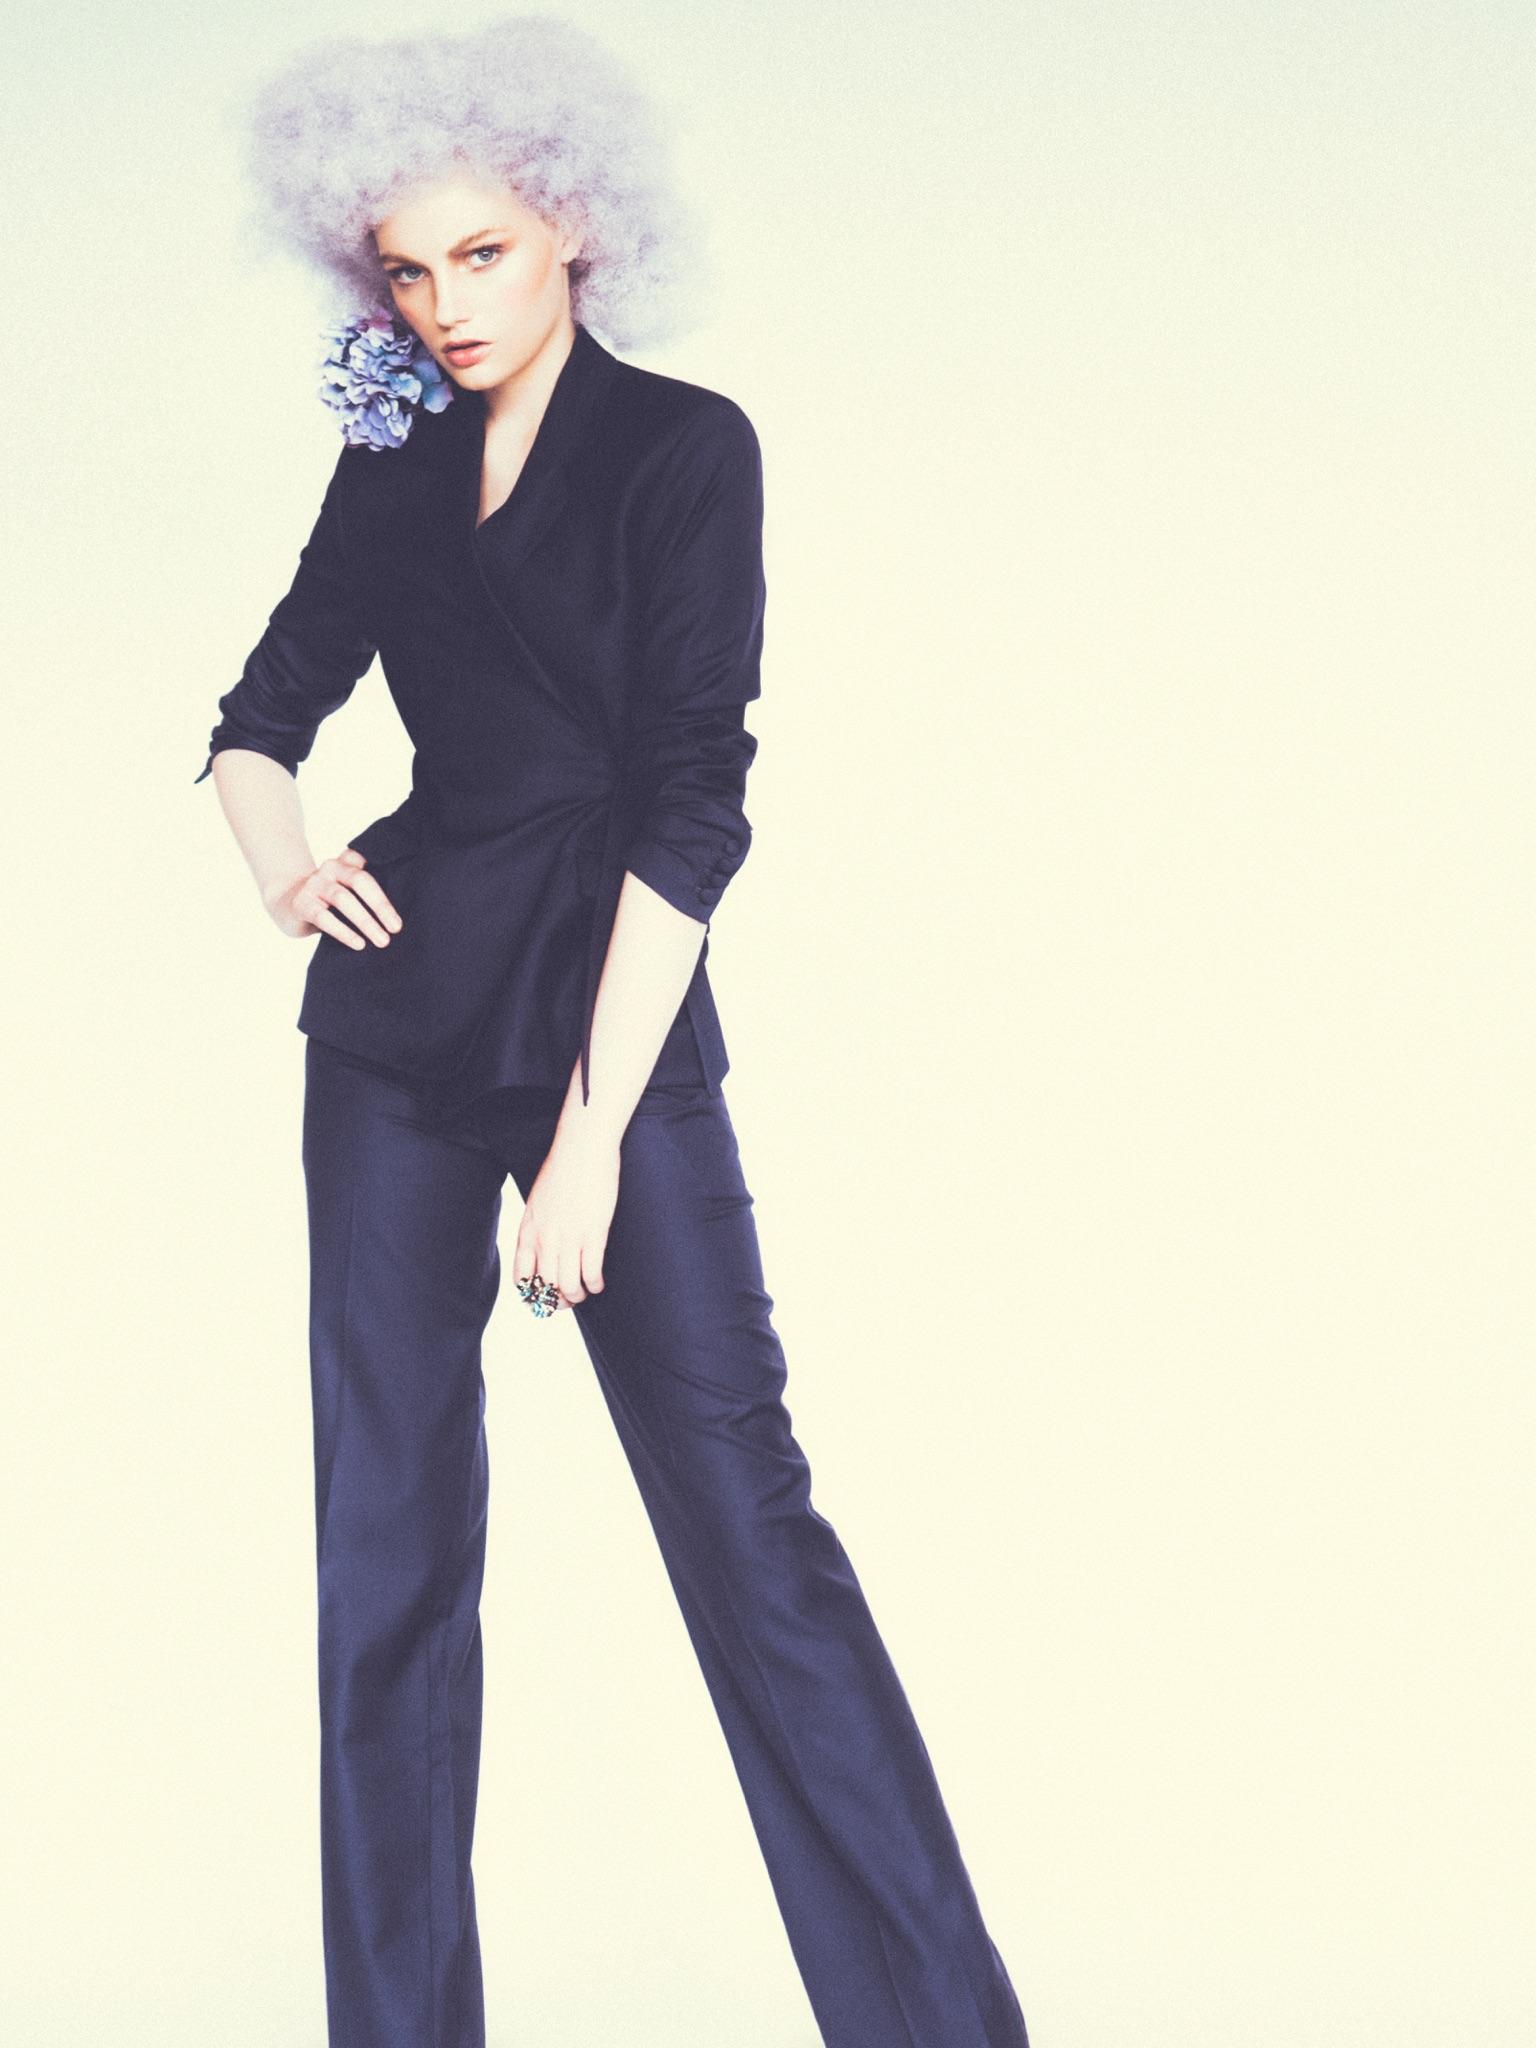 Fran Summers Francesca Summers Storm Model Management Jay McLaughlin